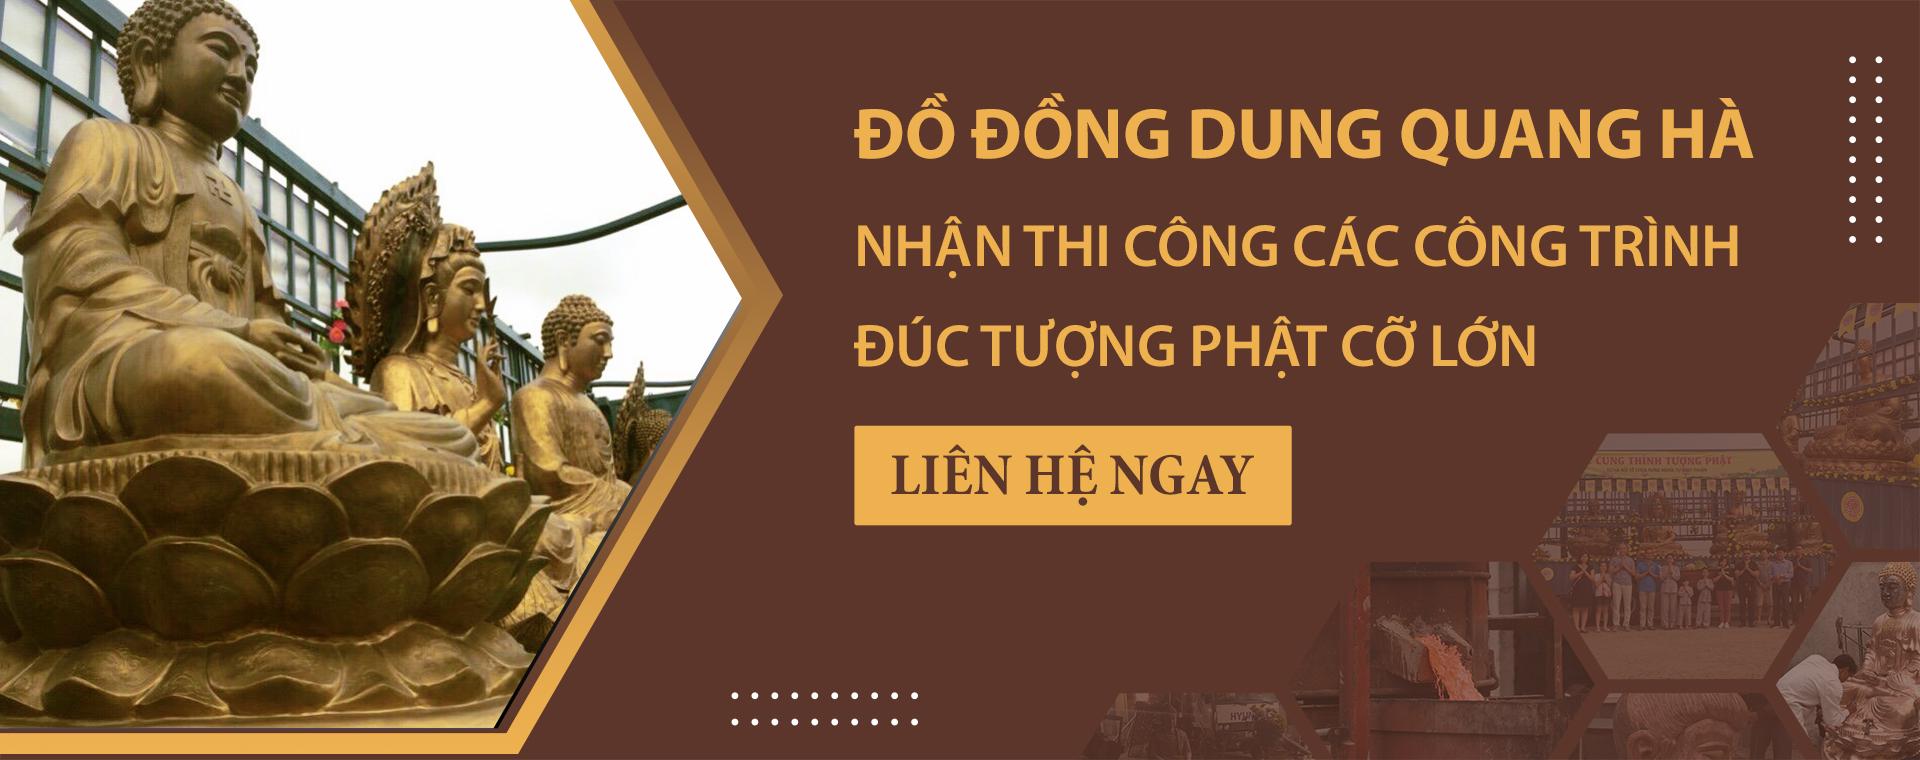 do-dong-dung-quang-ha-nhan-thi-cong-cac-cong-trinh-duc-tuong-phat-co-lon